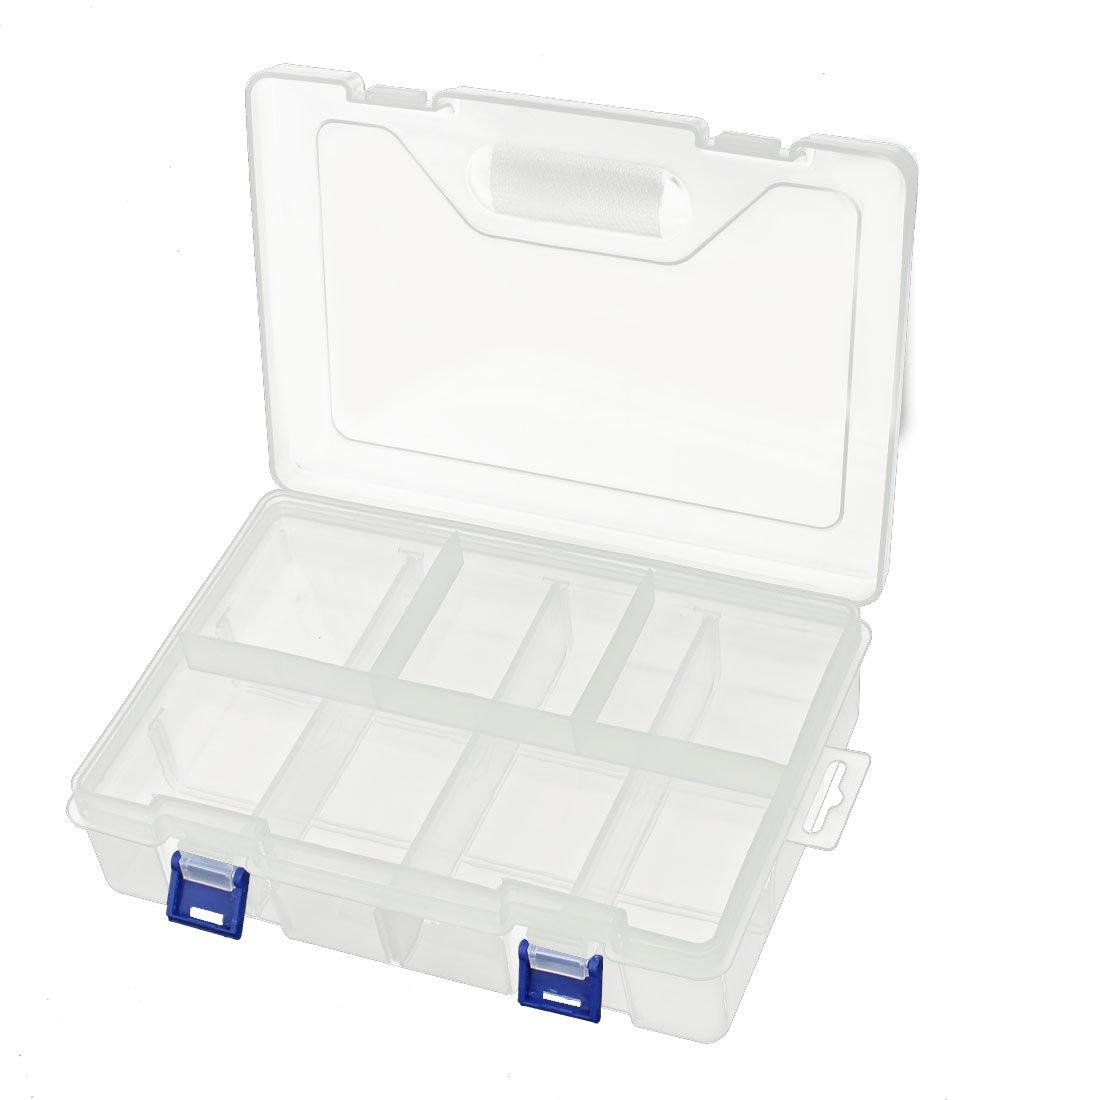 uxcell 245mmx157mmx57mm 8 Slots 2 Buckle Component Storage Organizer Case DIY Tool